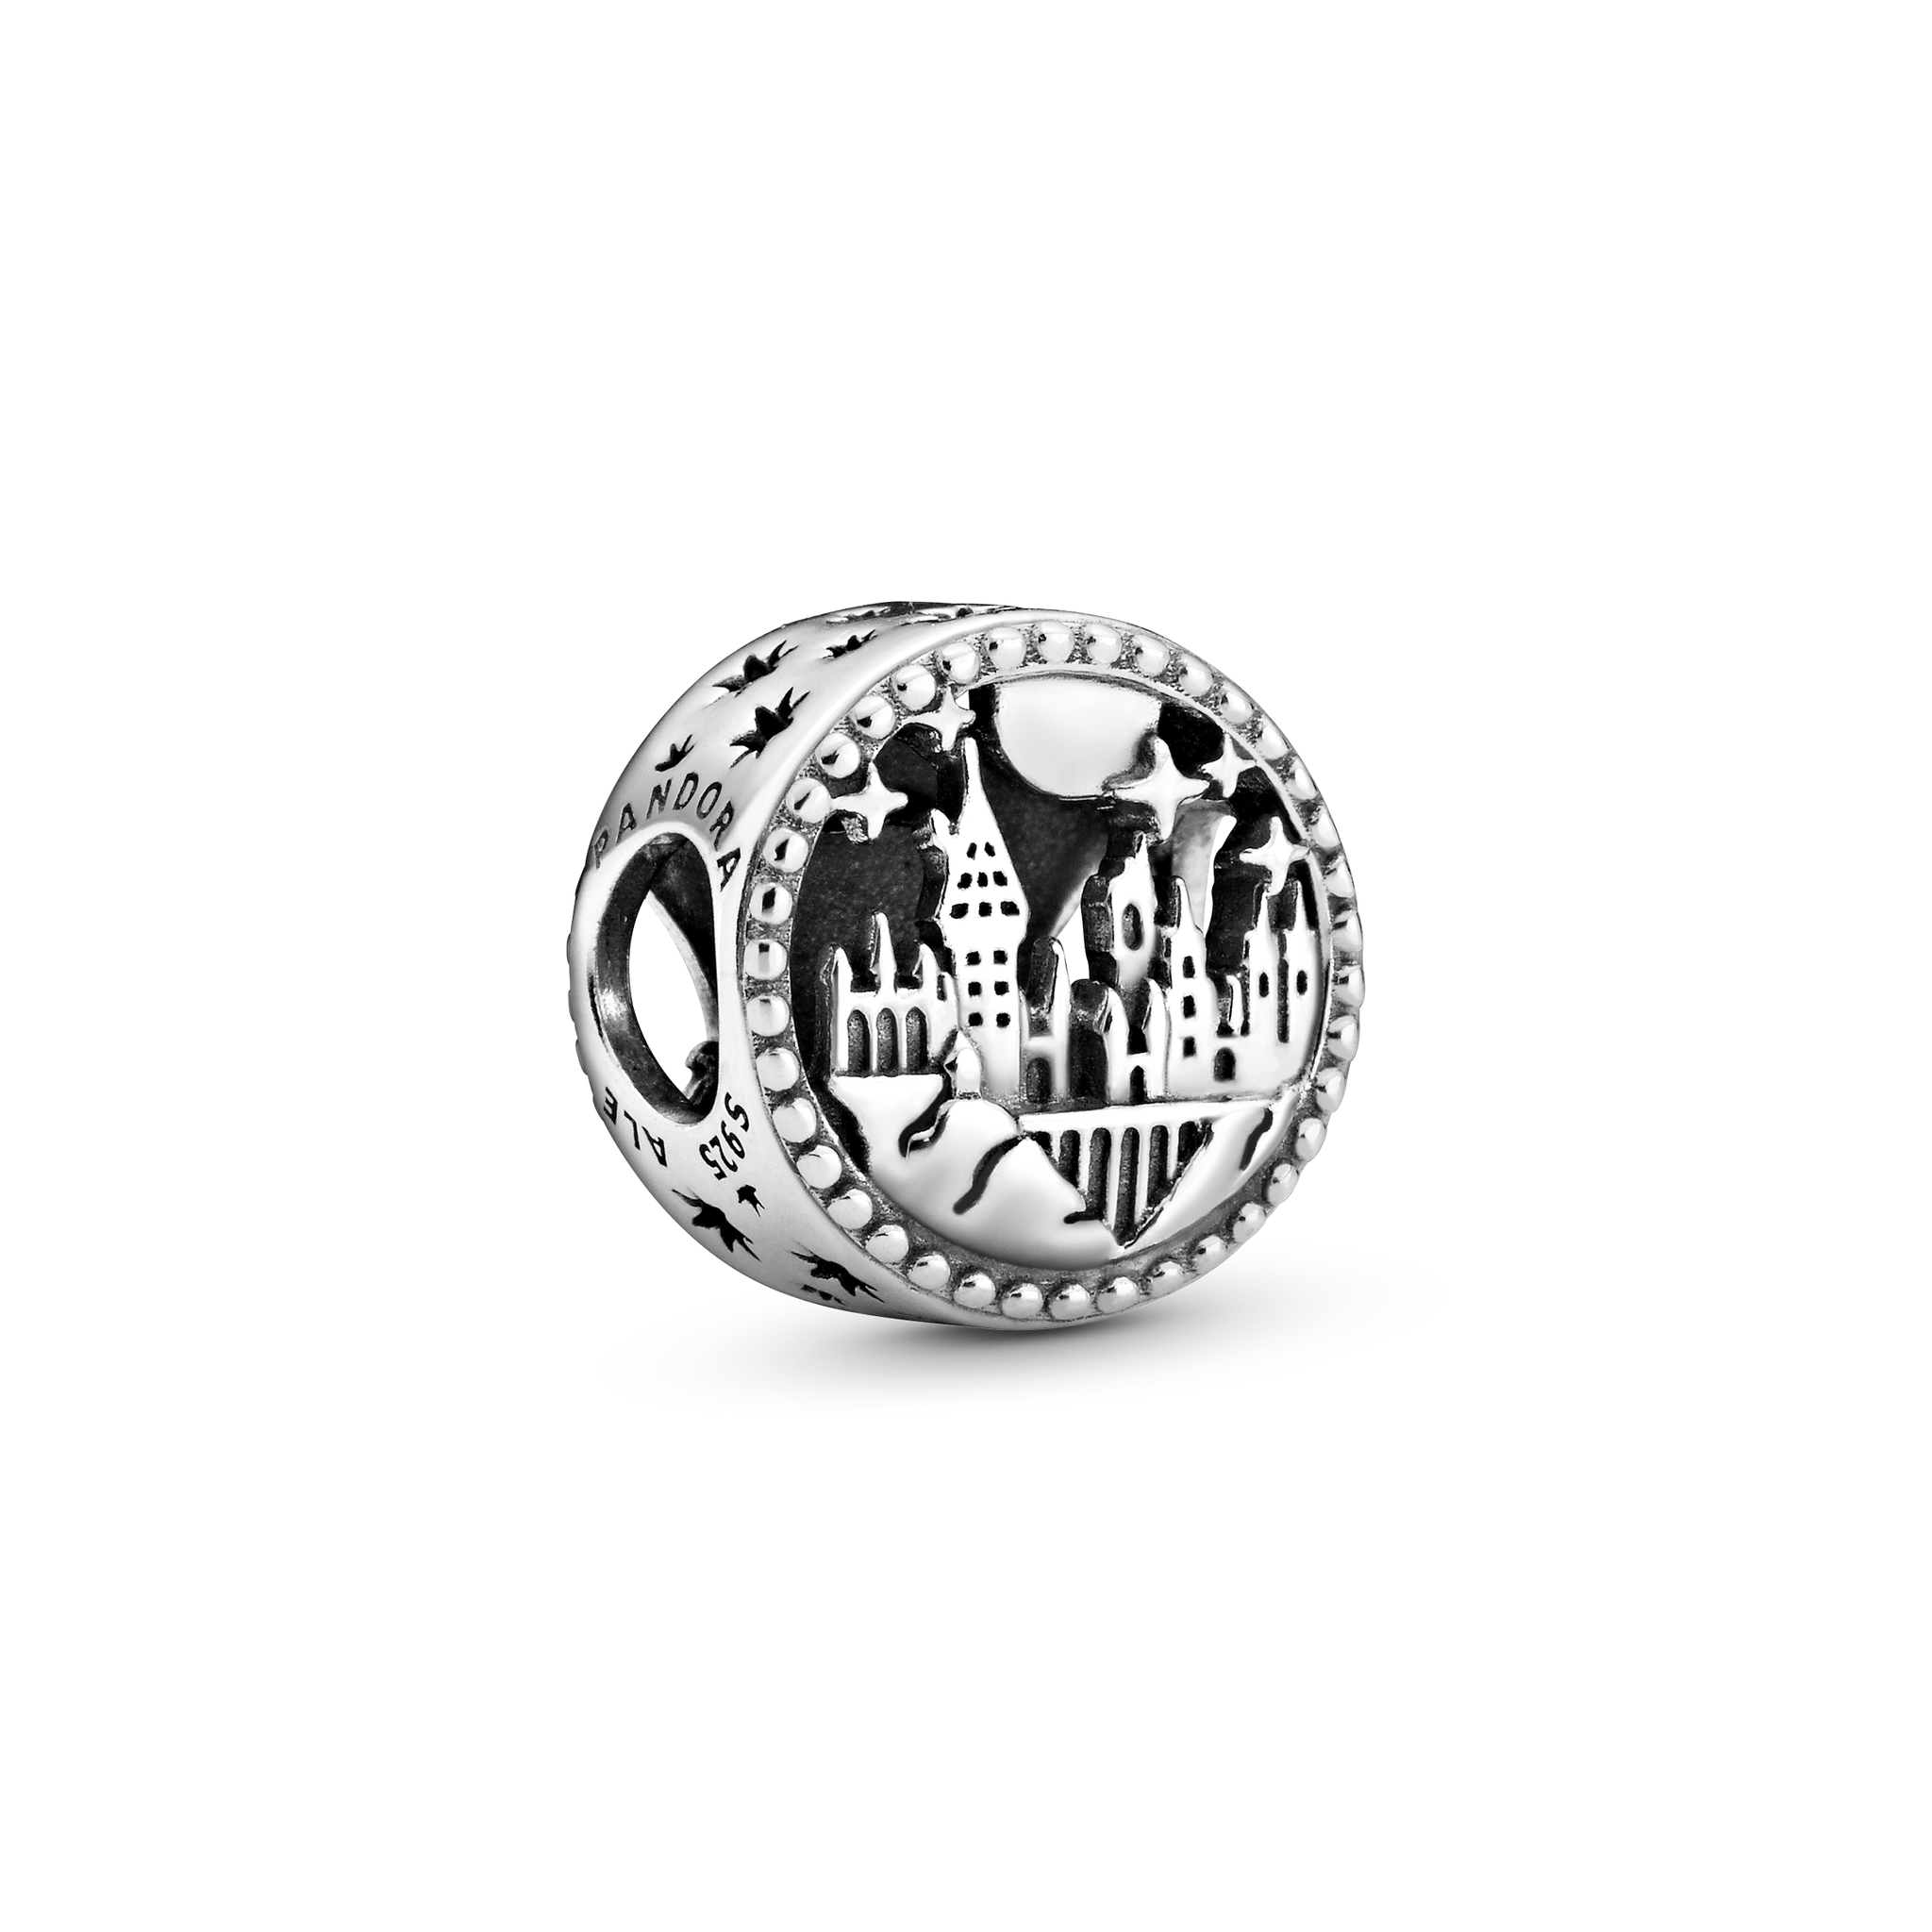 Pandora Harry Potter Charm Collection   2020   POPSUGAR Smart Living